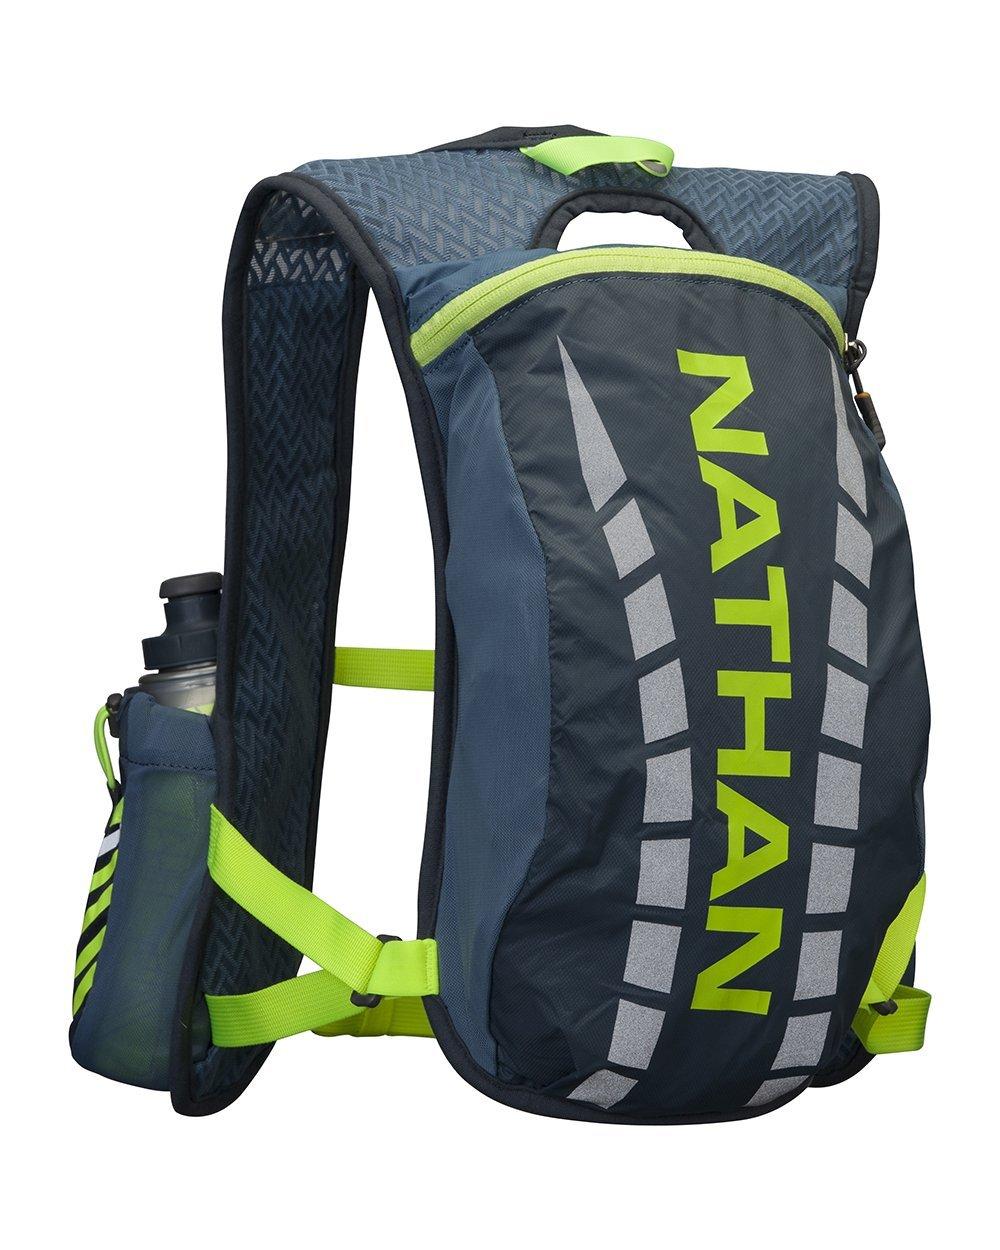 Nathan 5036NDSS Fireball Race Vest, Bluestone, One Size by Nathan (Image #1)